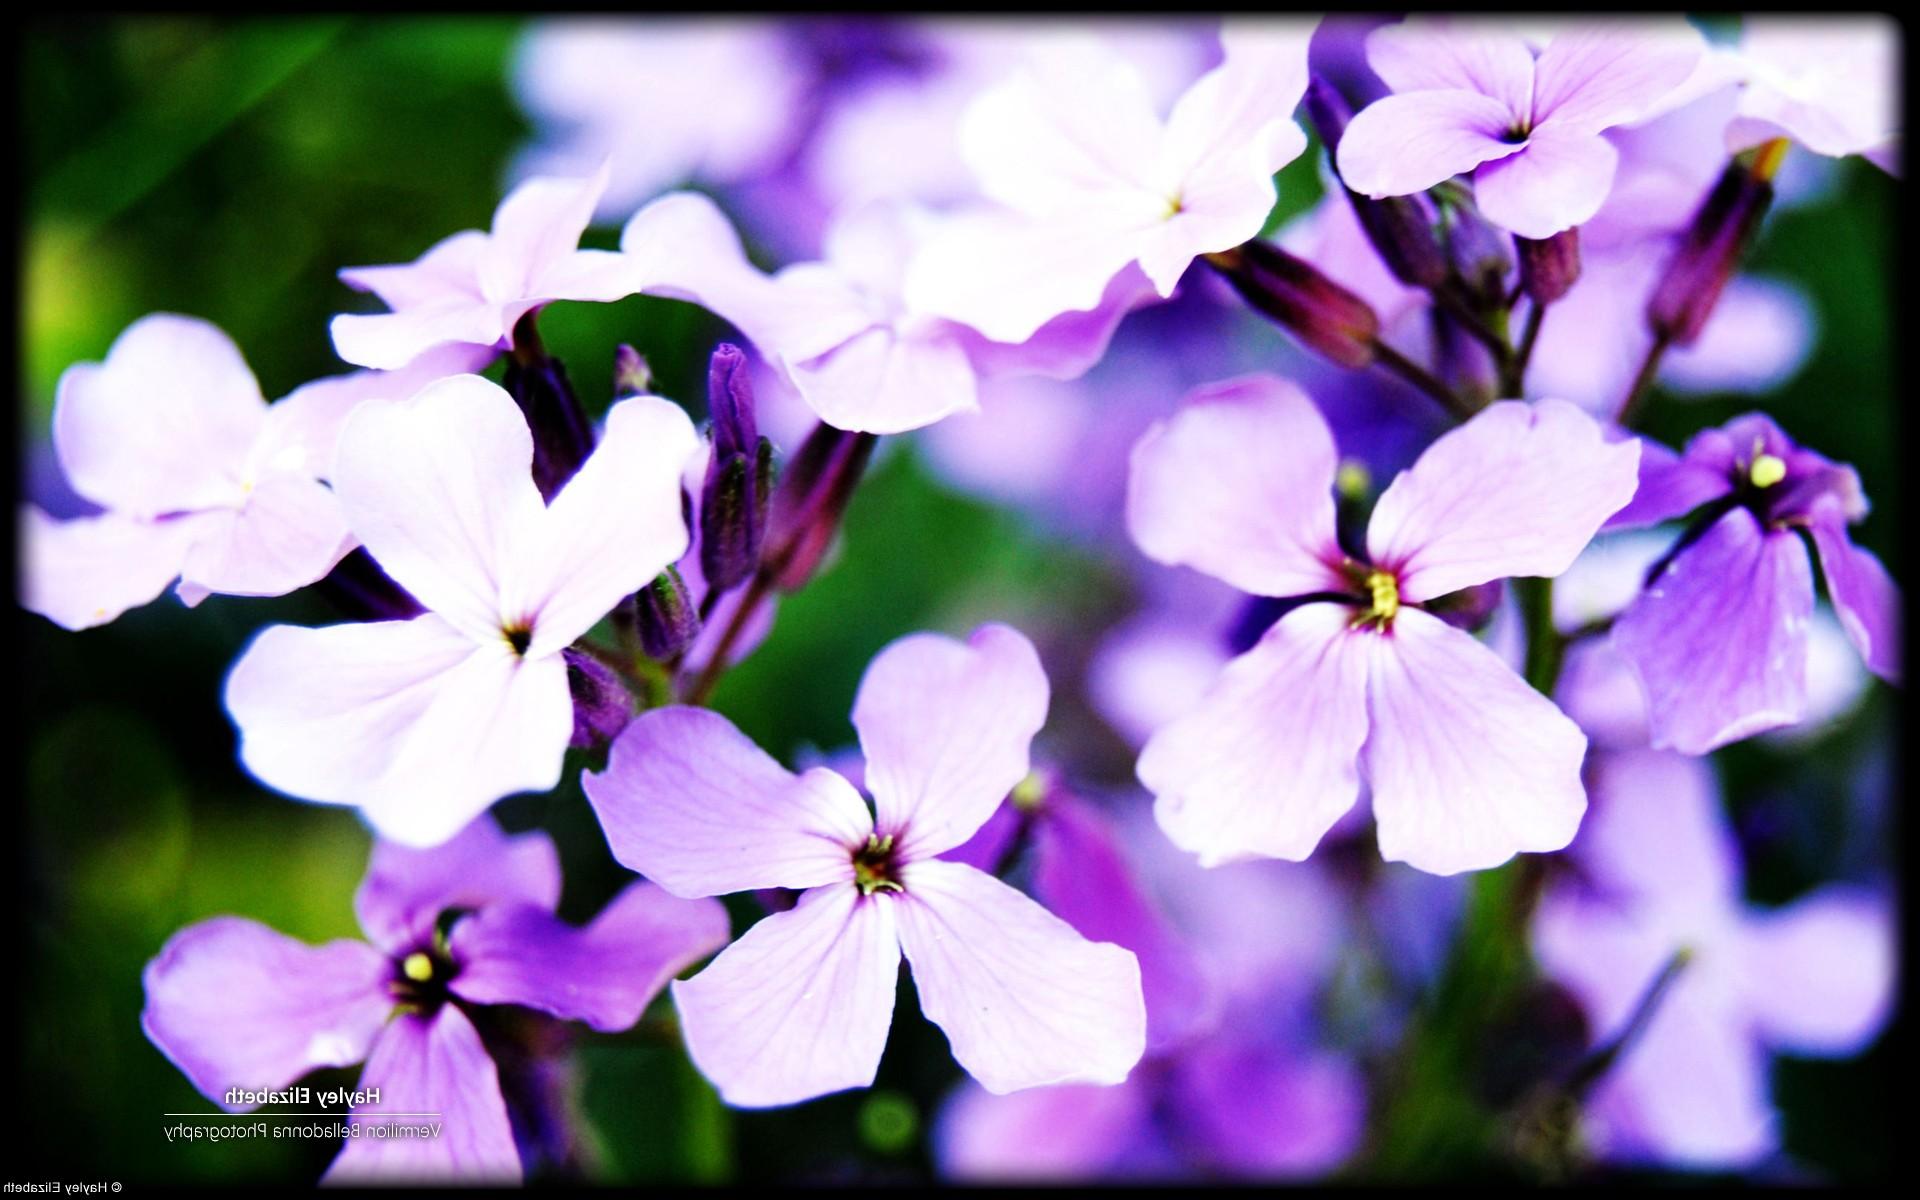 Цветы фиолетовые цветы